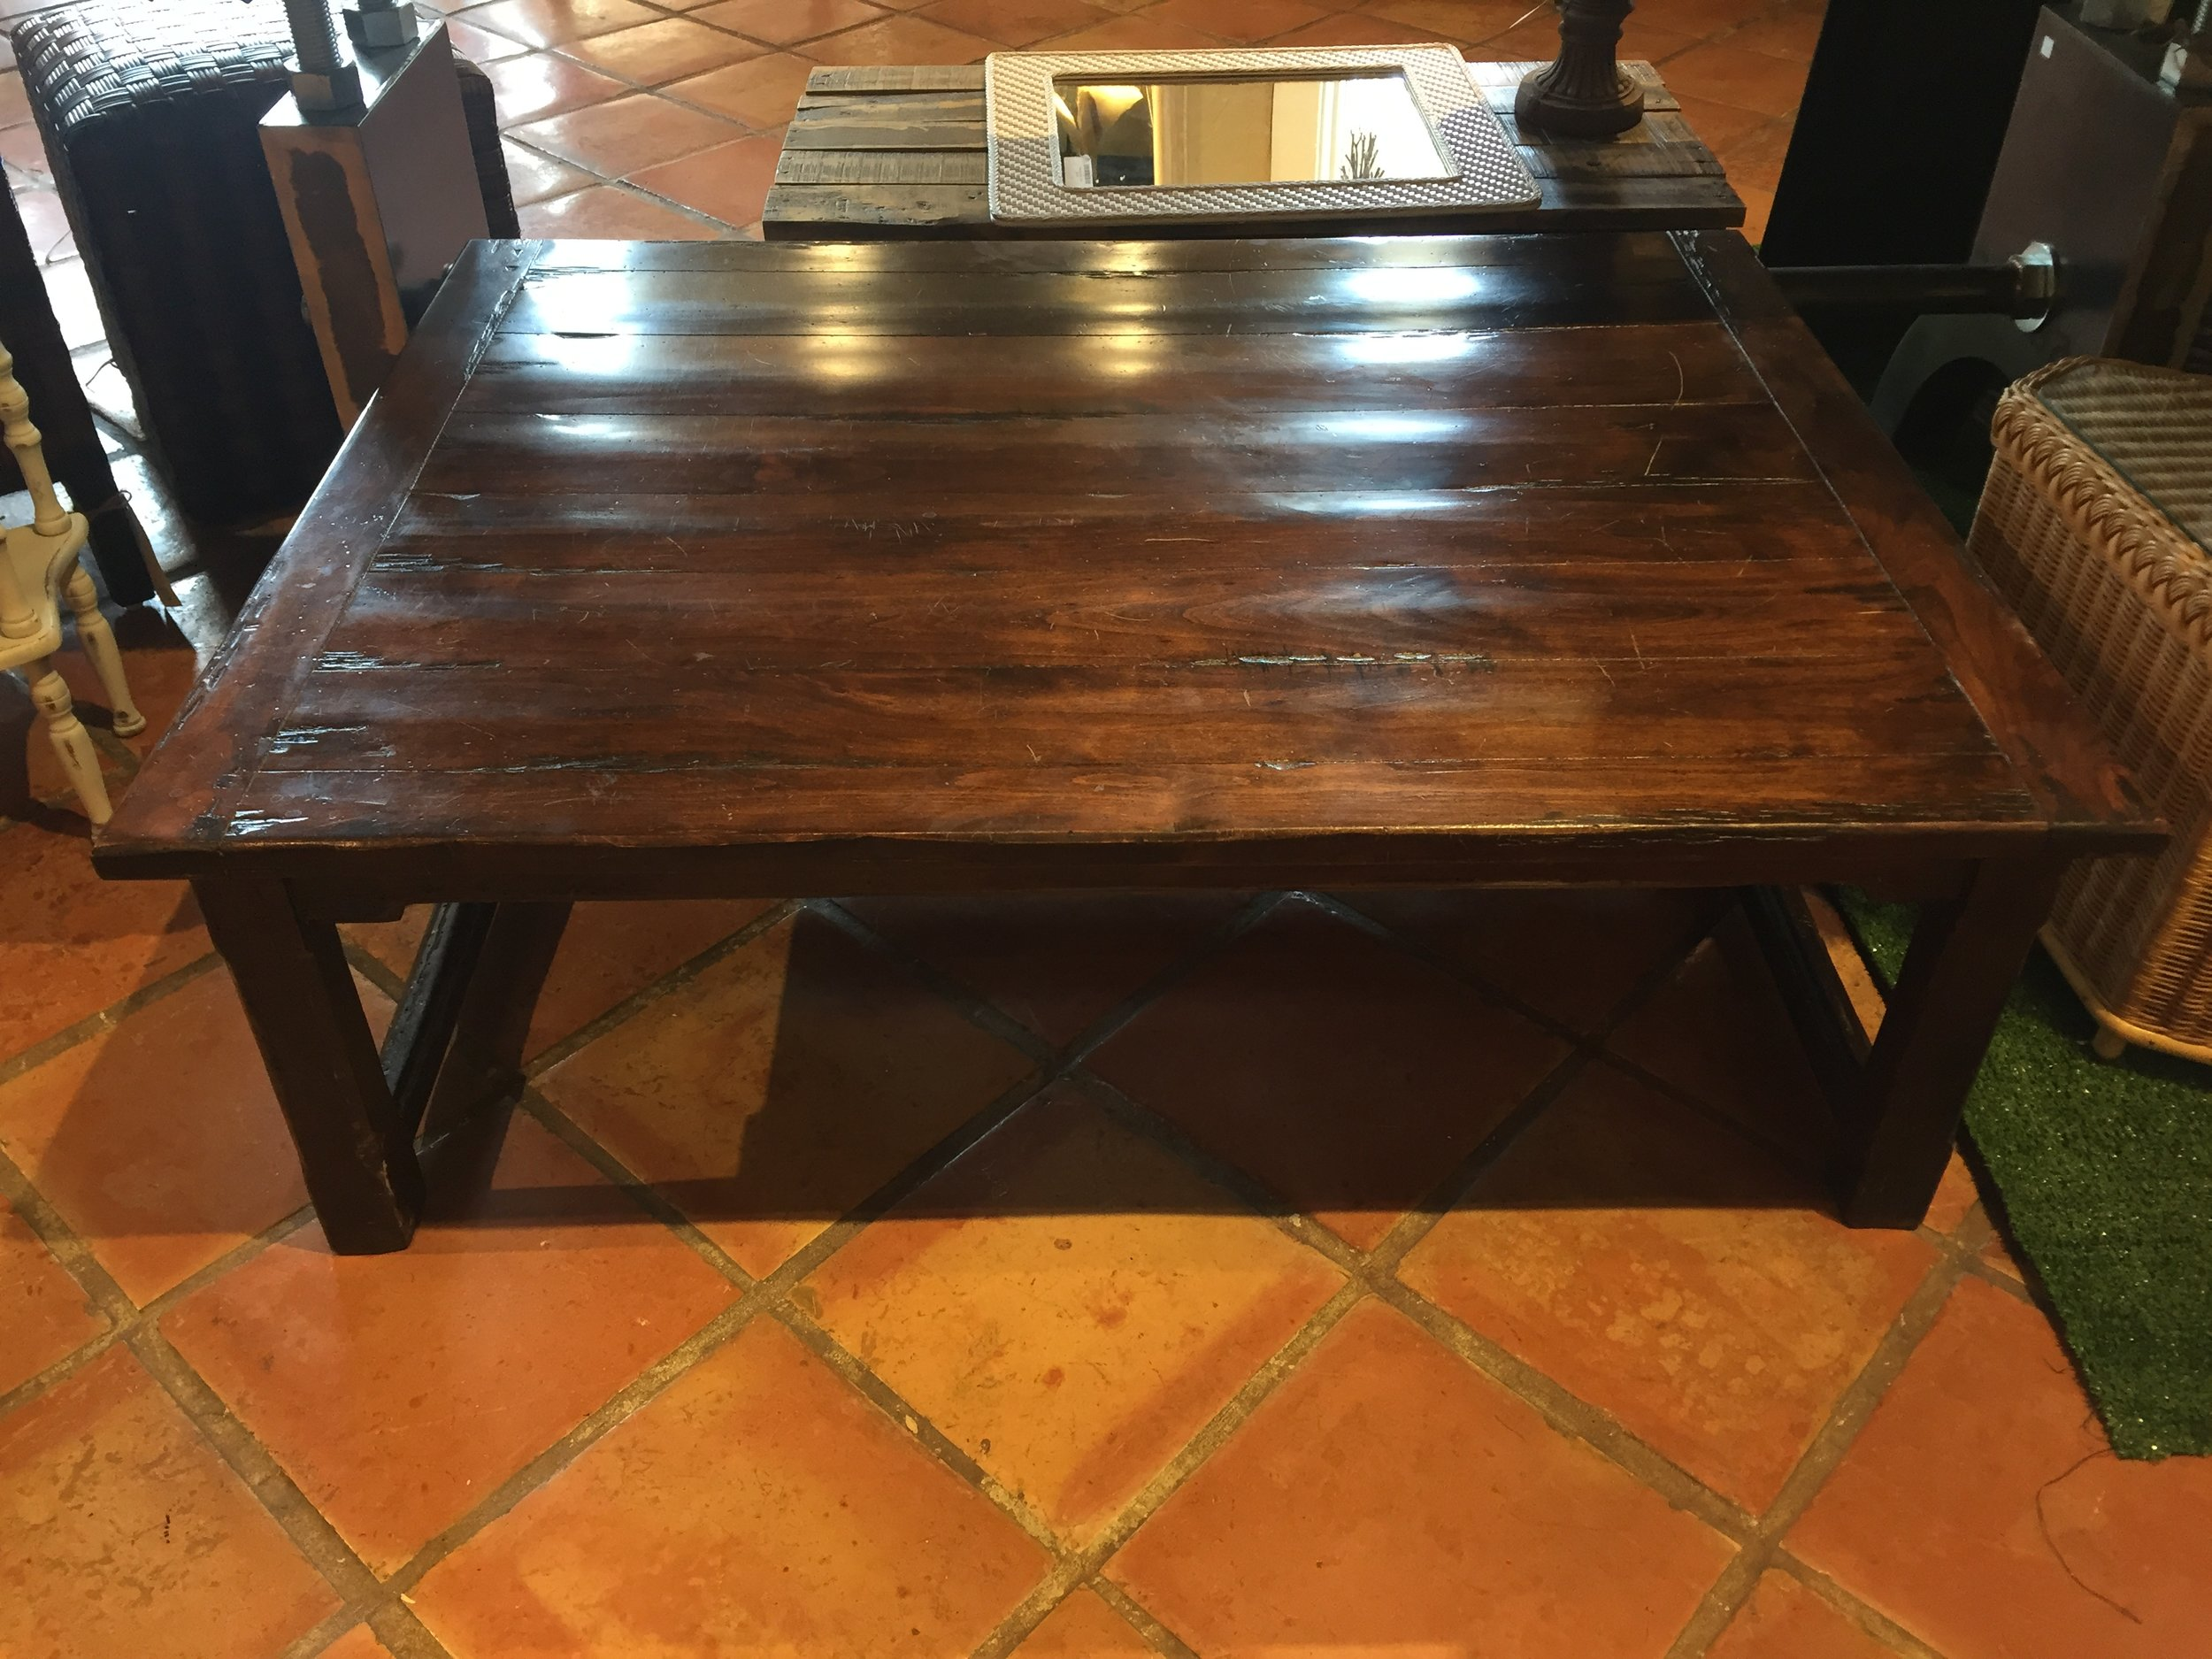 Baussman Coffee Table $395.95 - C1060 22606